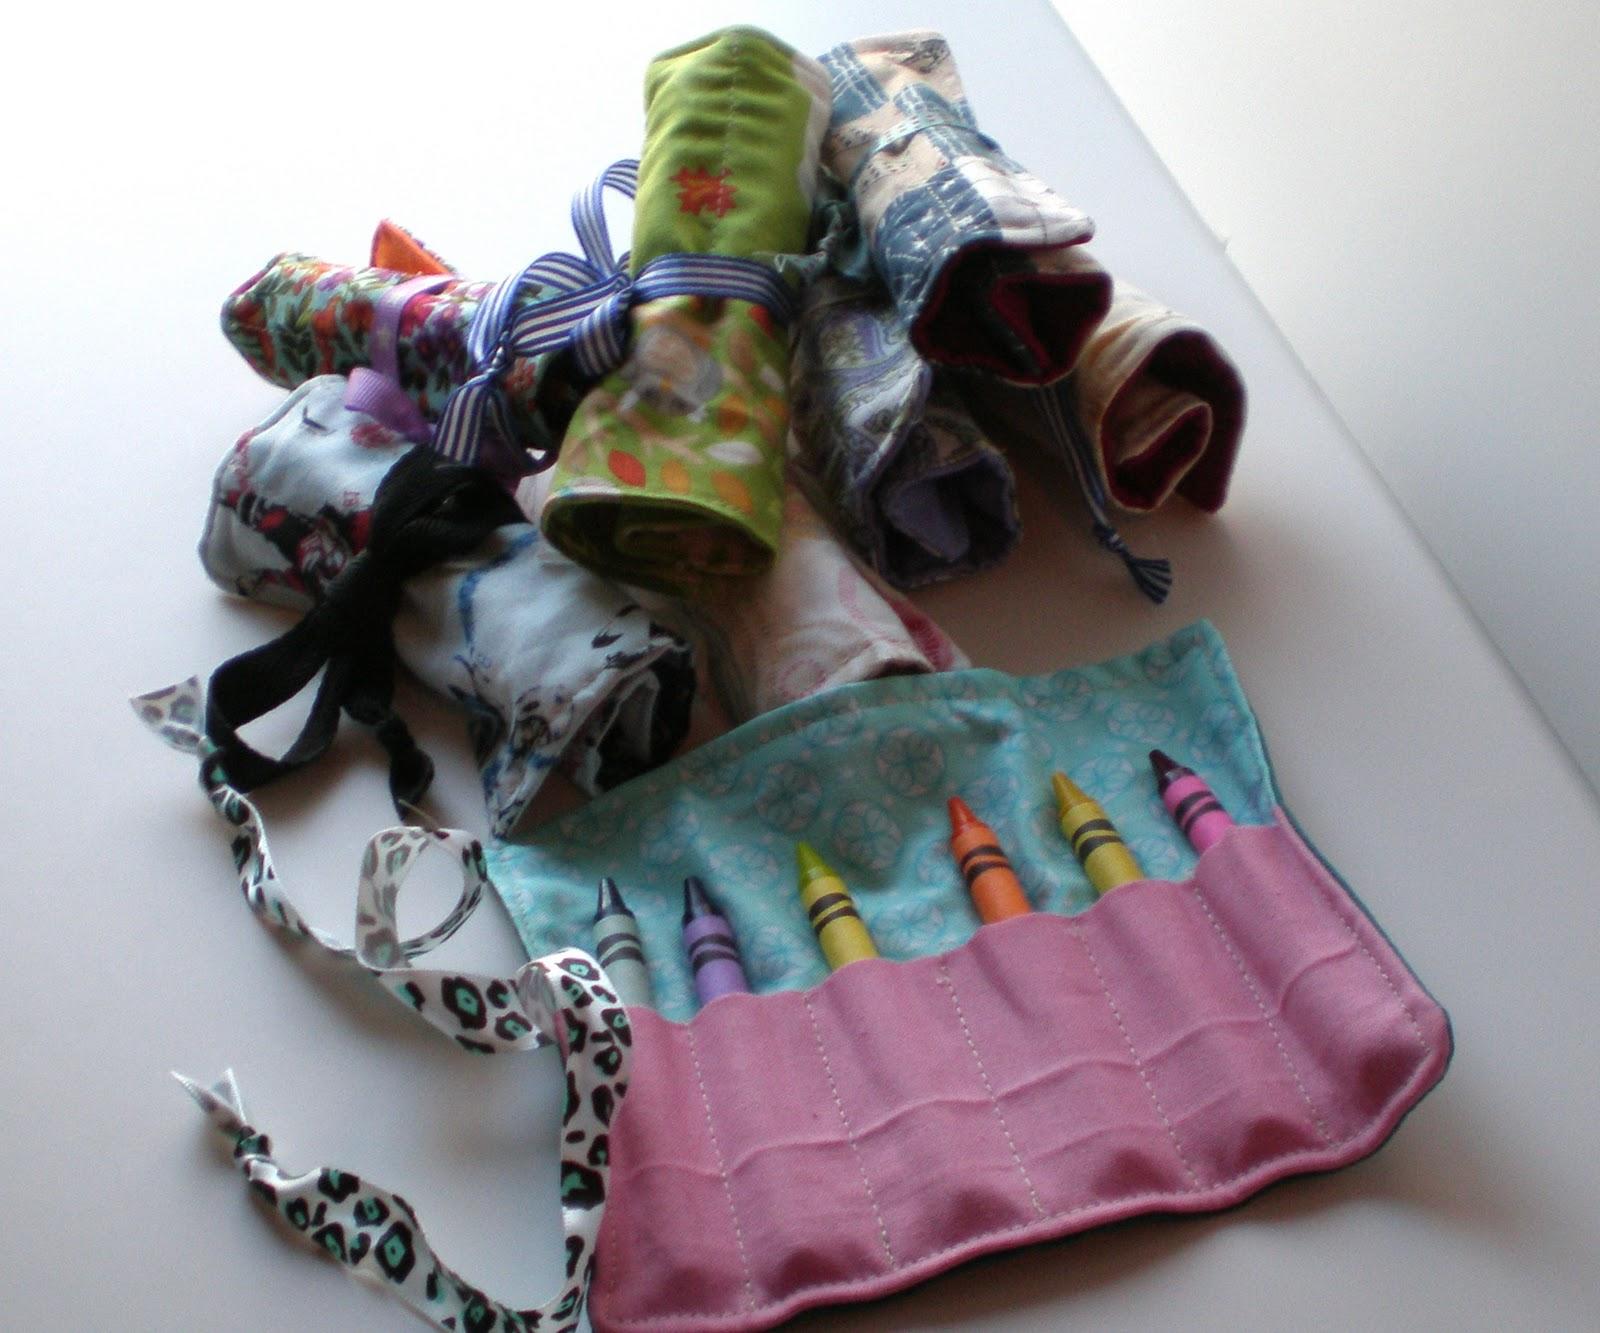 Tutorials Crafts Projects Kids Children Handmade Homemade